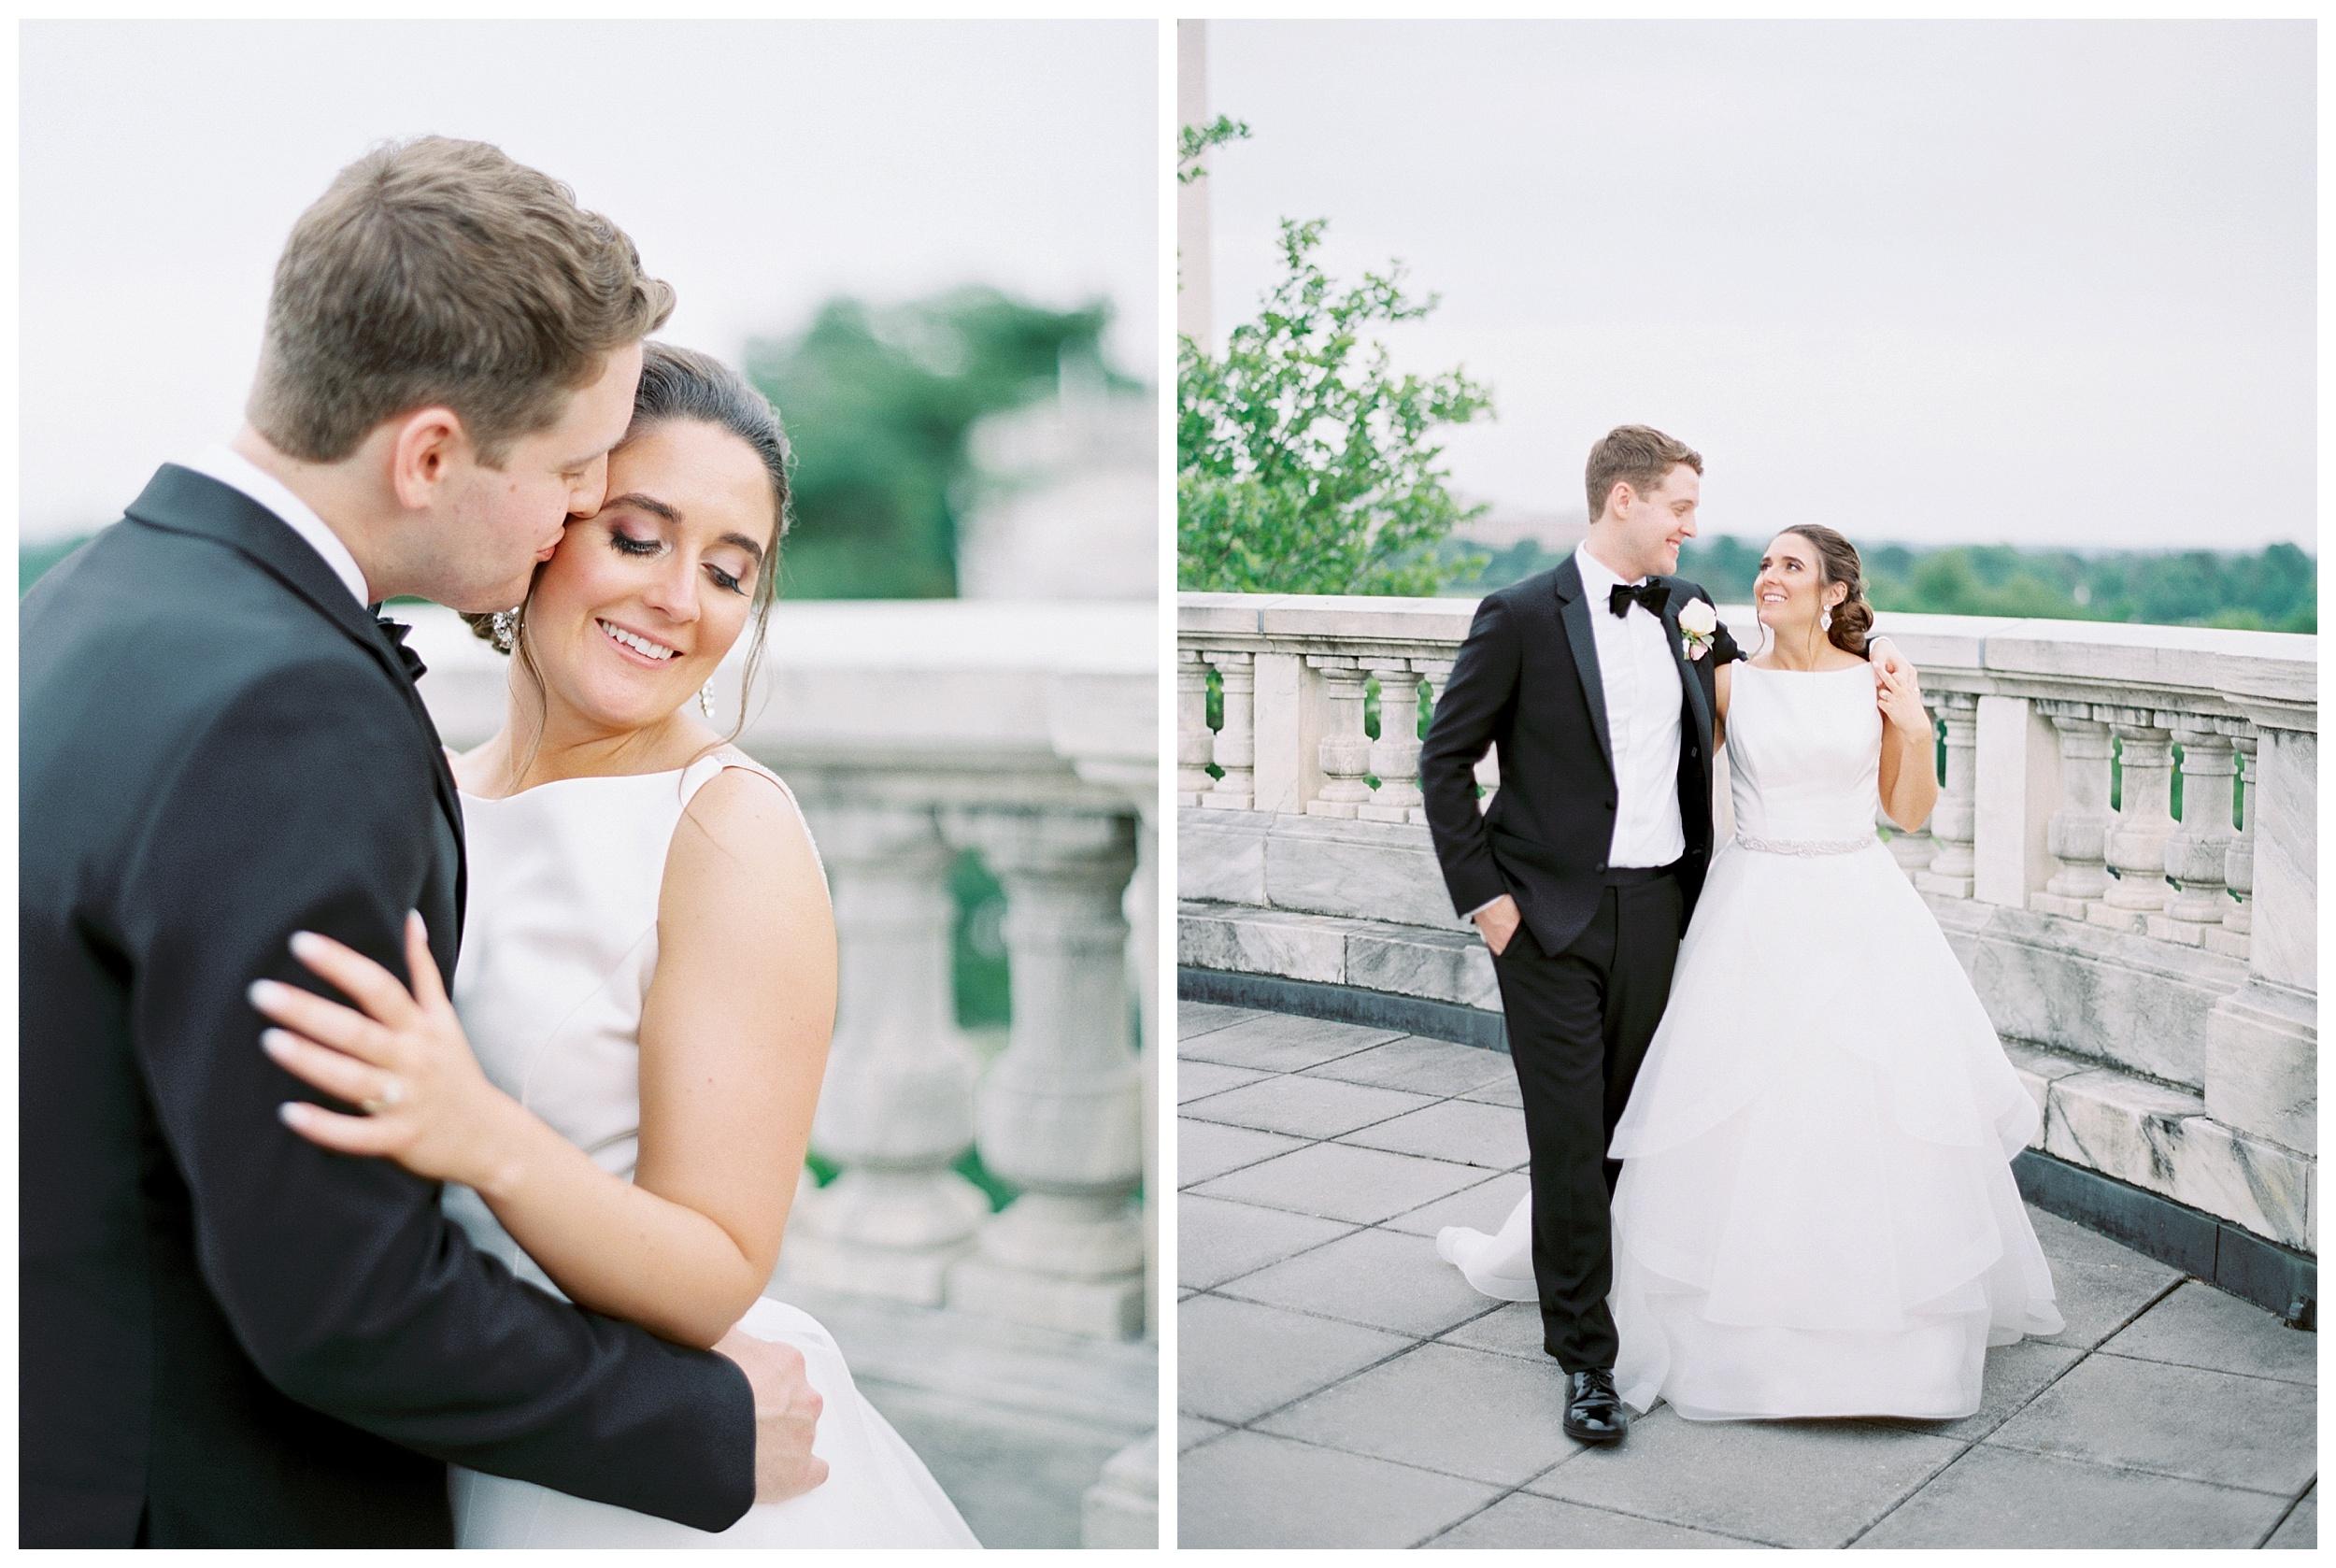 DAR Constitution Hall Wedding Wedding | Daughters of the American Revolution Wedding | District of Columbia Film Wedding Photographer Kir Tuben_0097.jpg